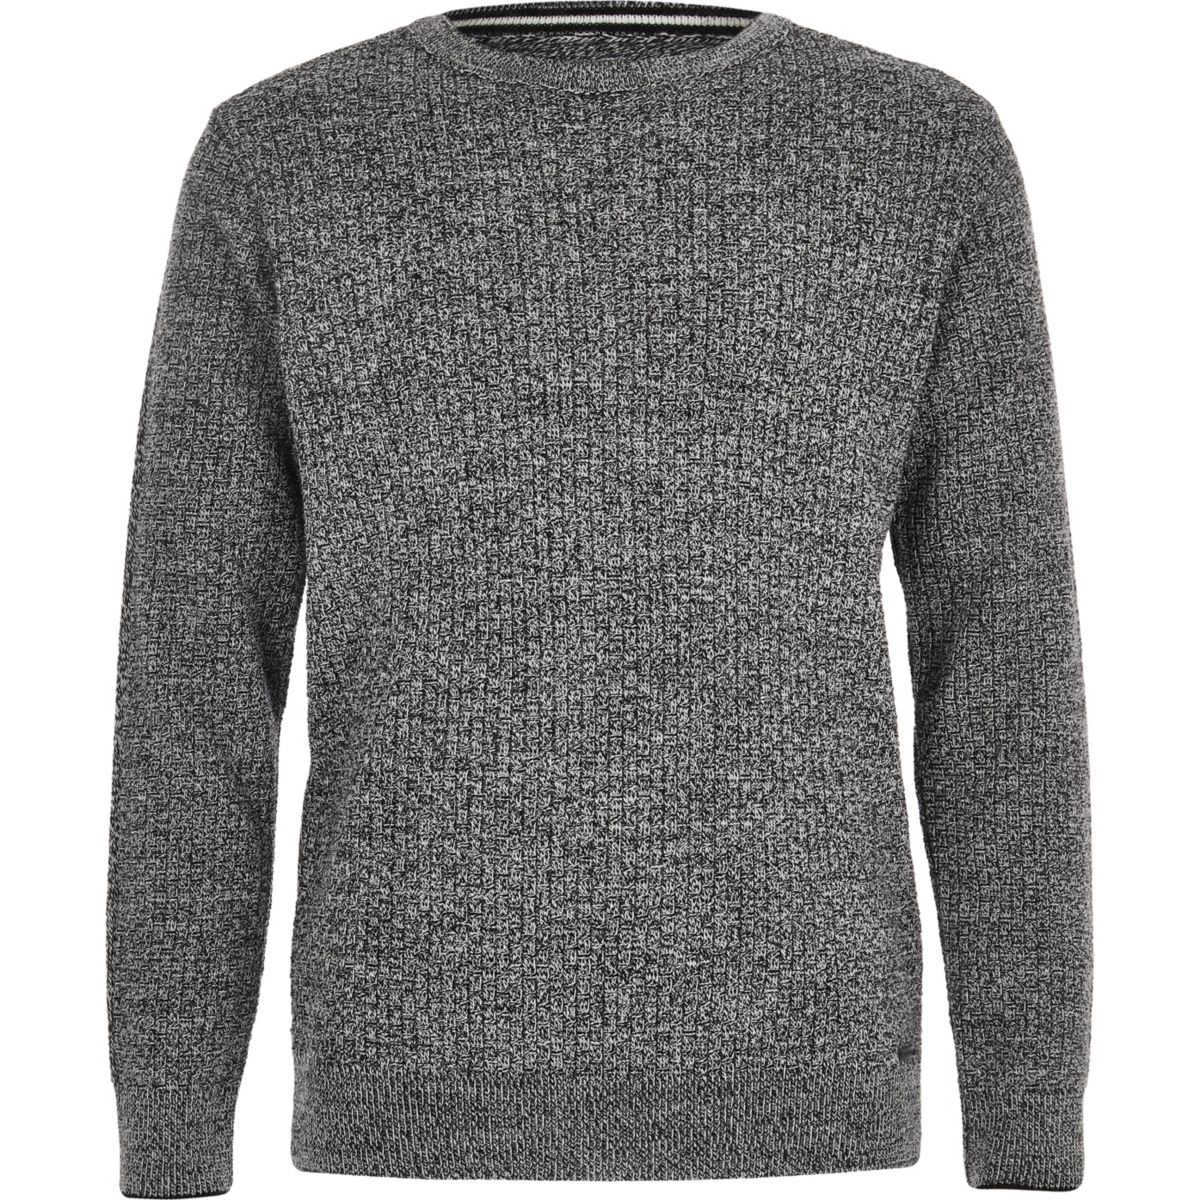 Boys grey mixed stitch jumper